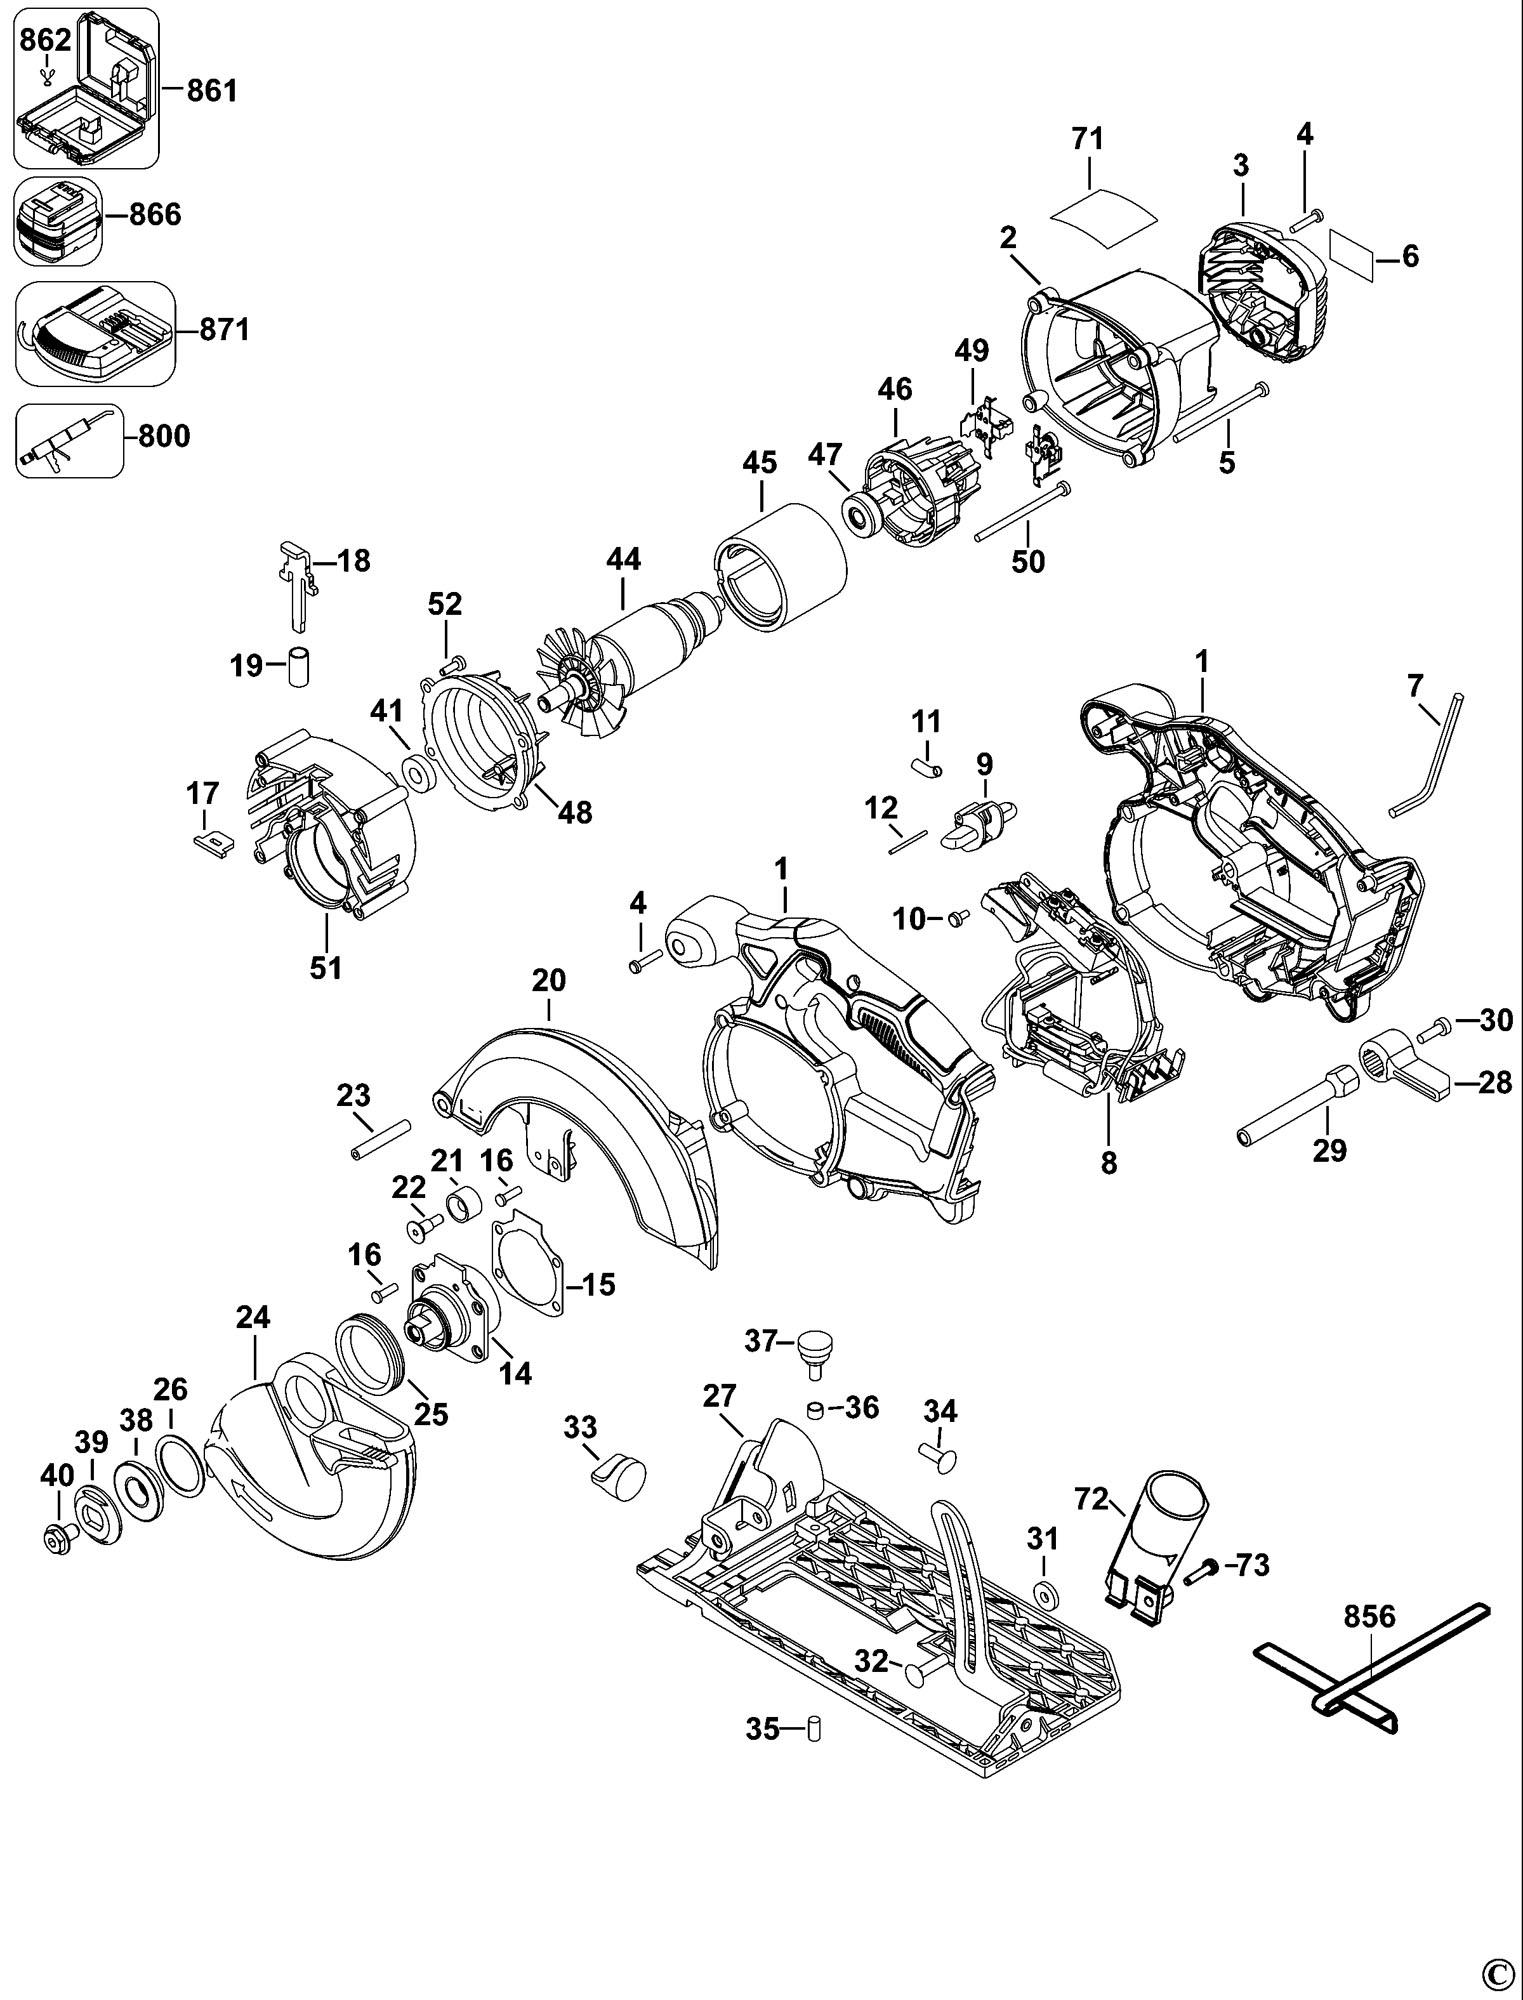 Spares For Dewalt Dcs391 Cordless Circular Saw Type 1